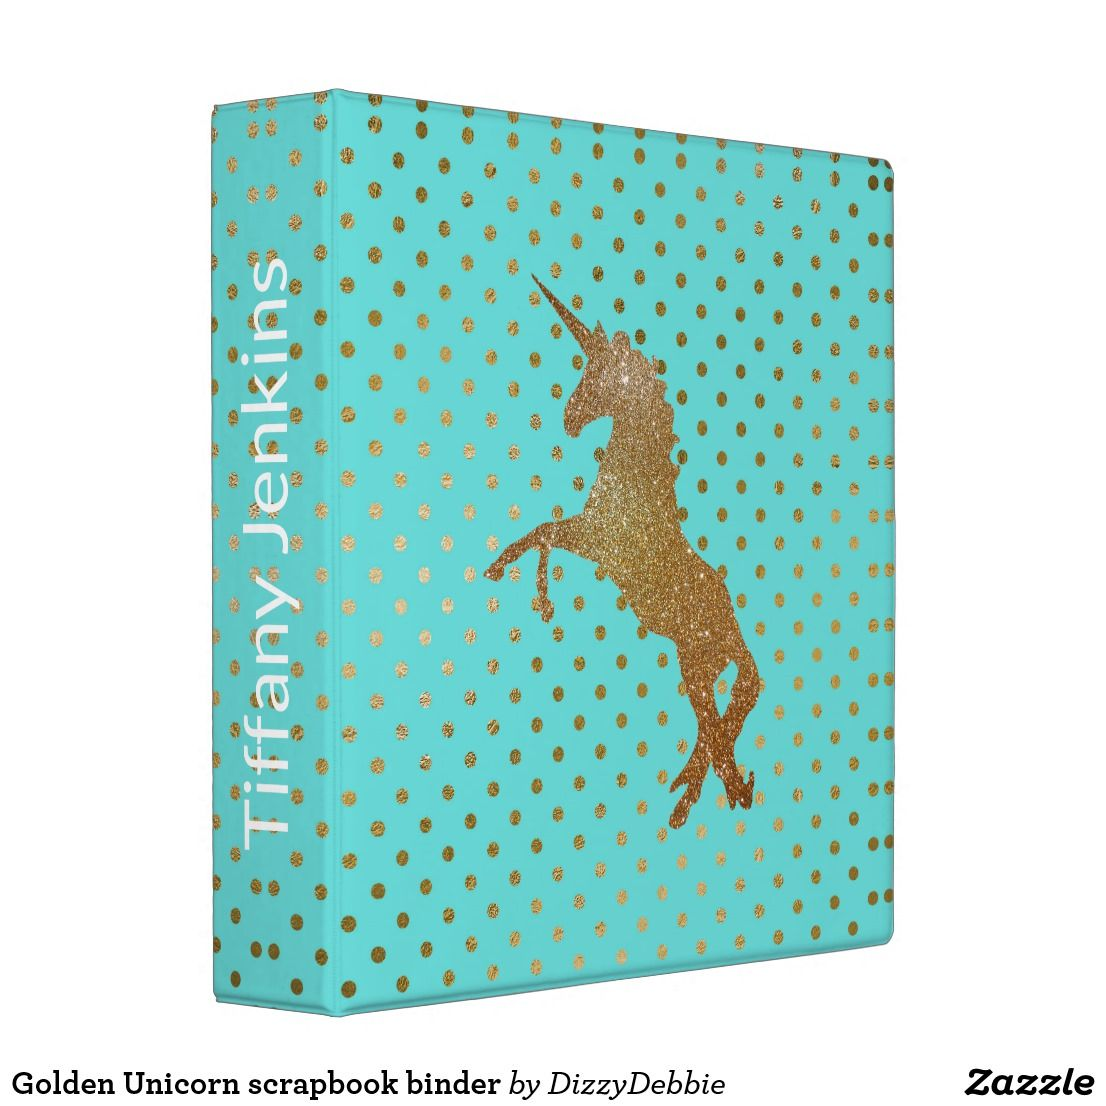 Golden Unicorn Scrapbook Binder